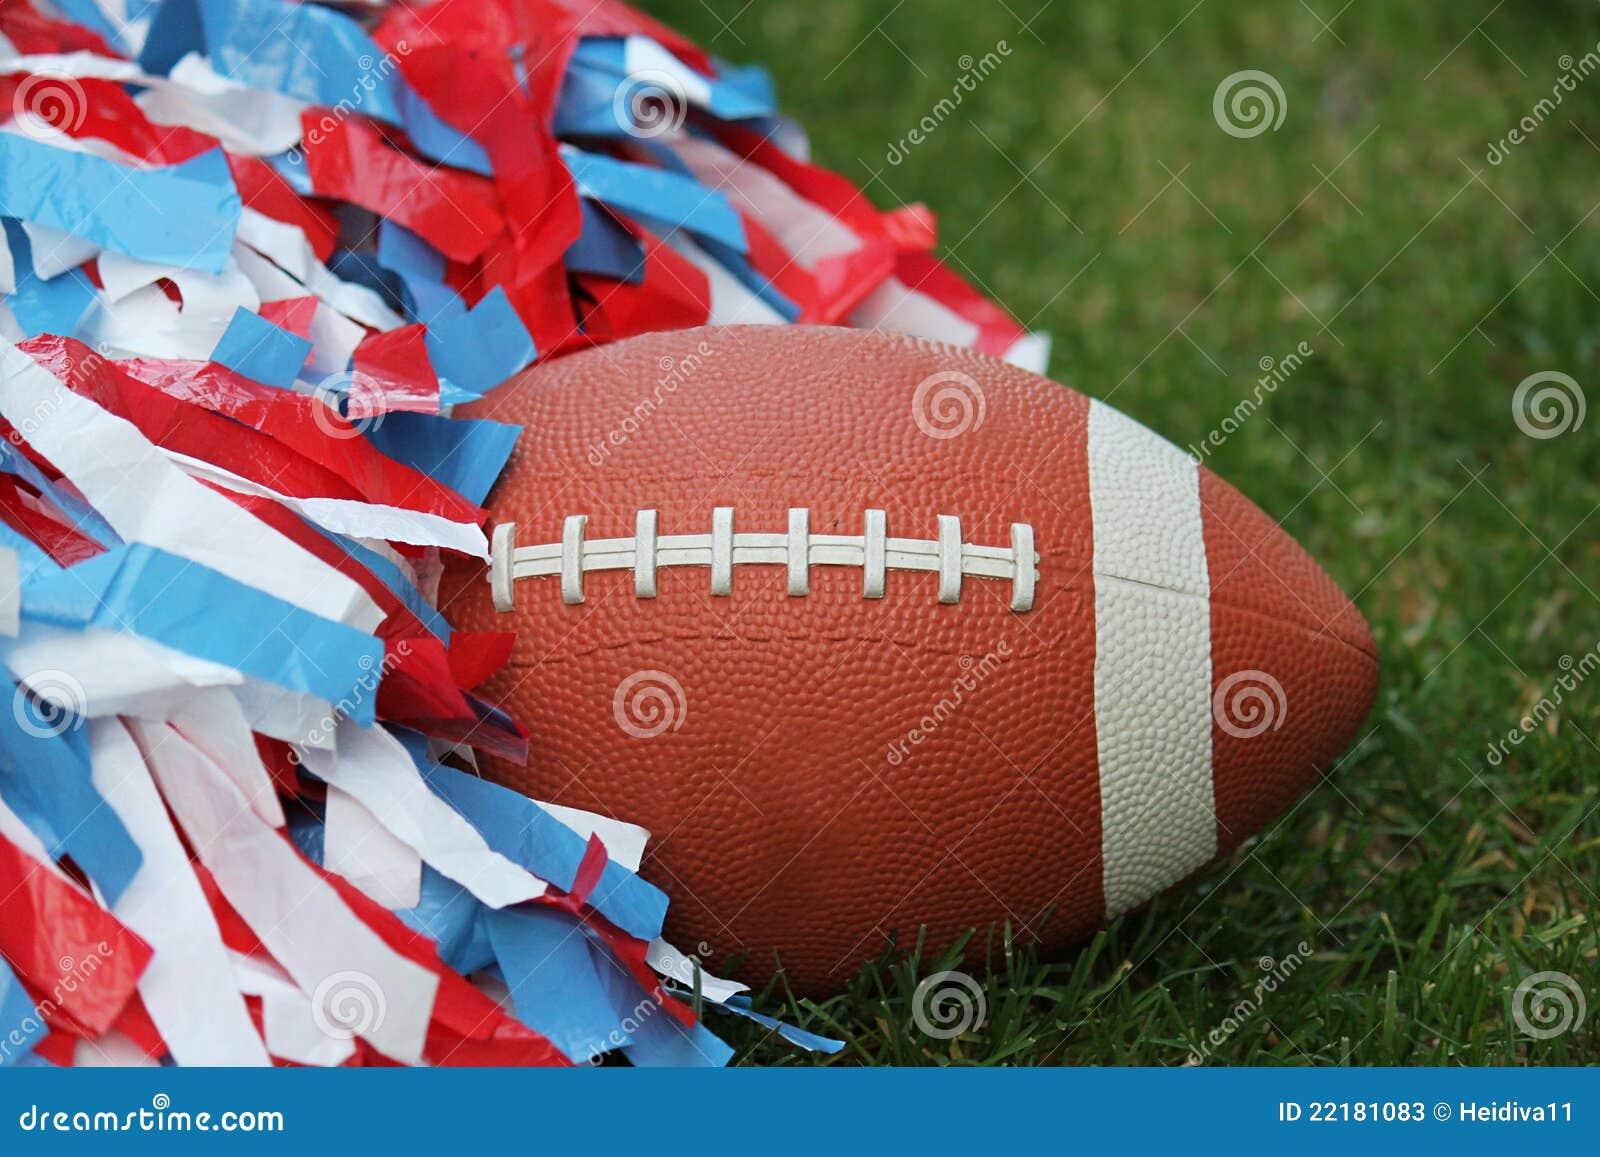 Cheerleading ποδόσφαιρο